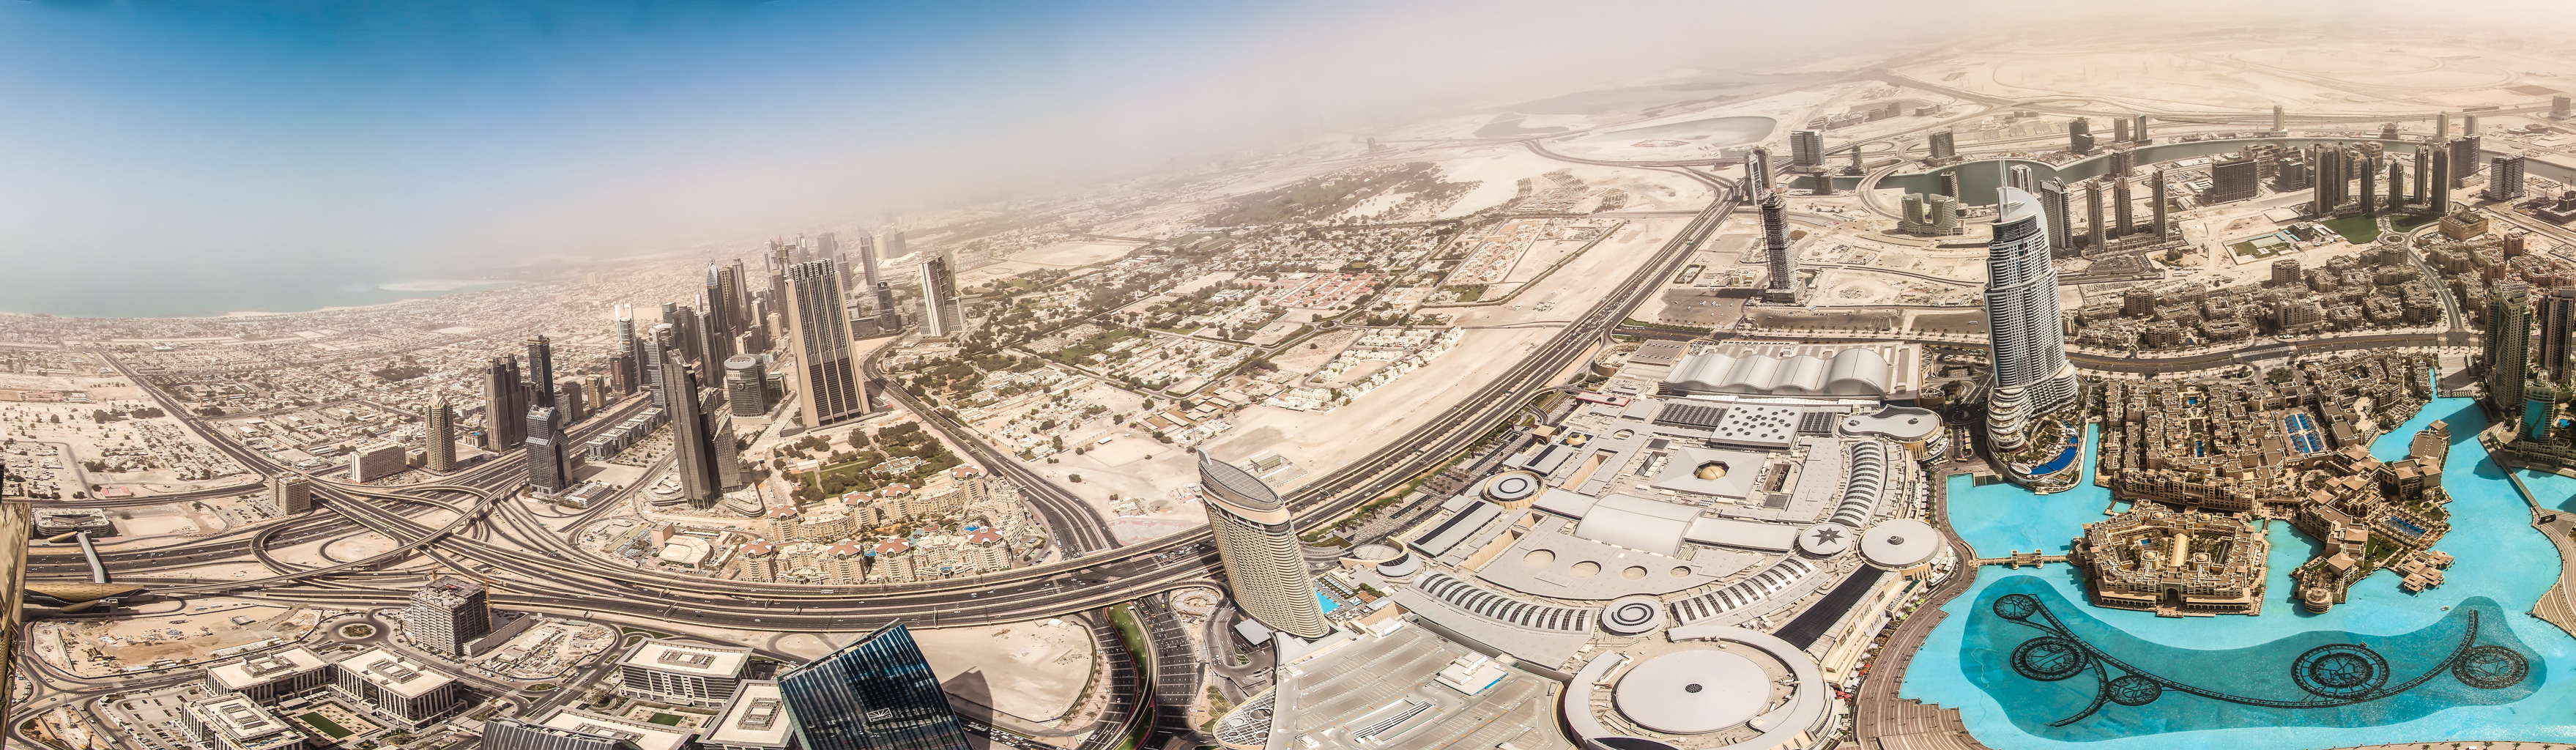 Panorama from Burj Khalifa (Dubai, UAE) by w3rw01f